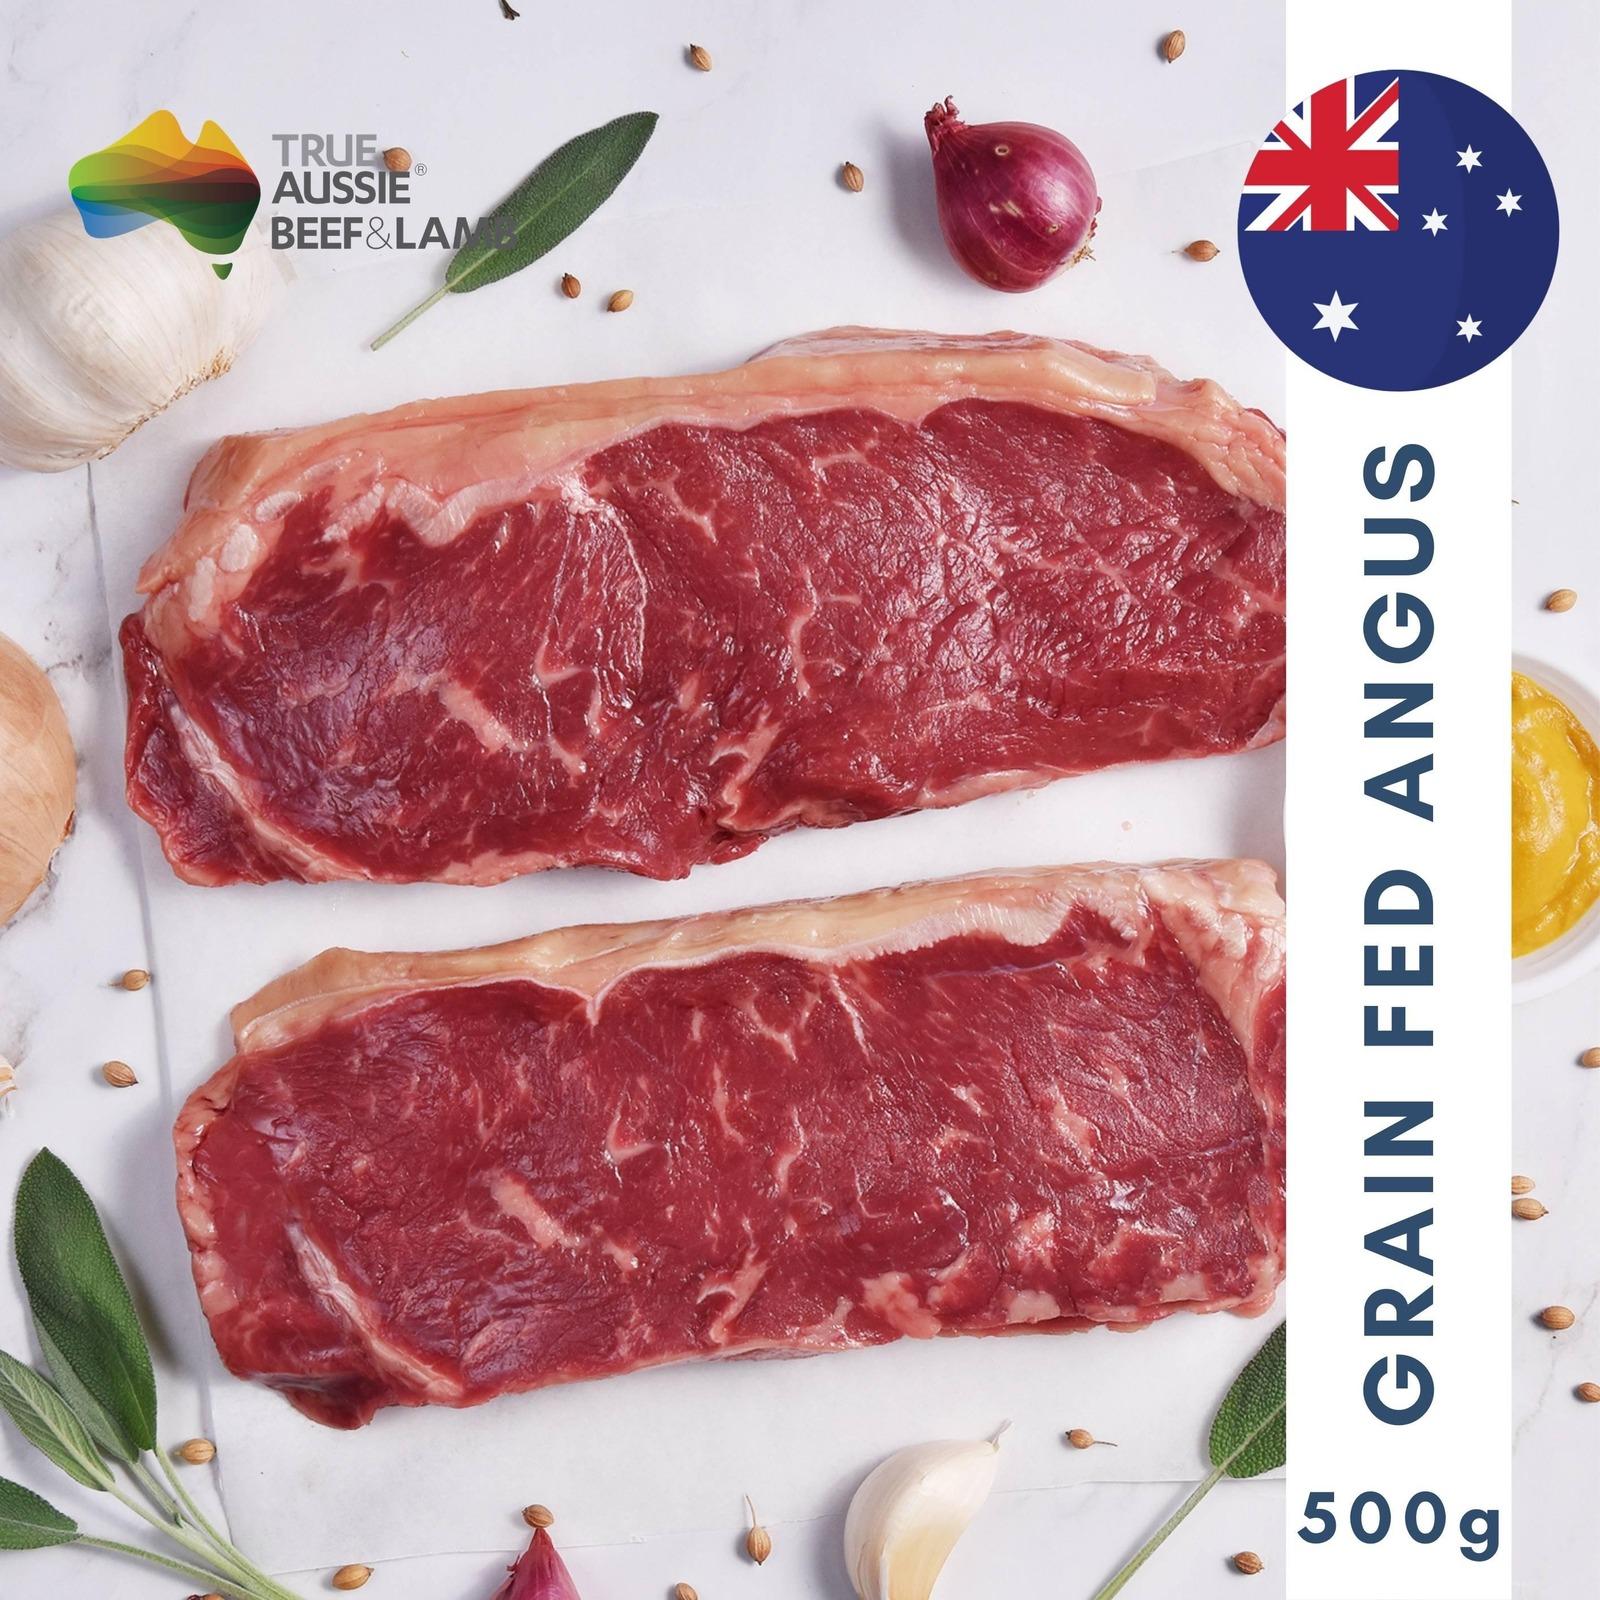 The Meat Club Angus Porterhouse Beef Steak - Australia